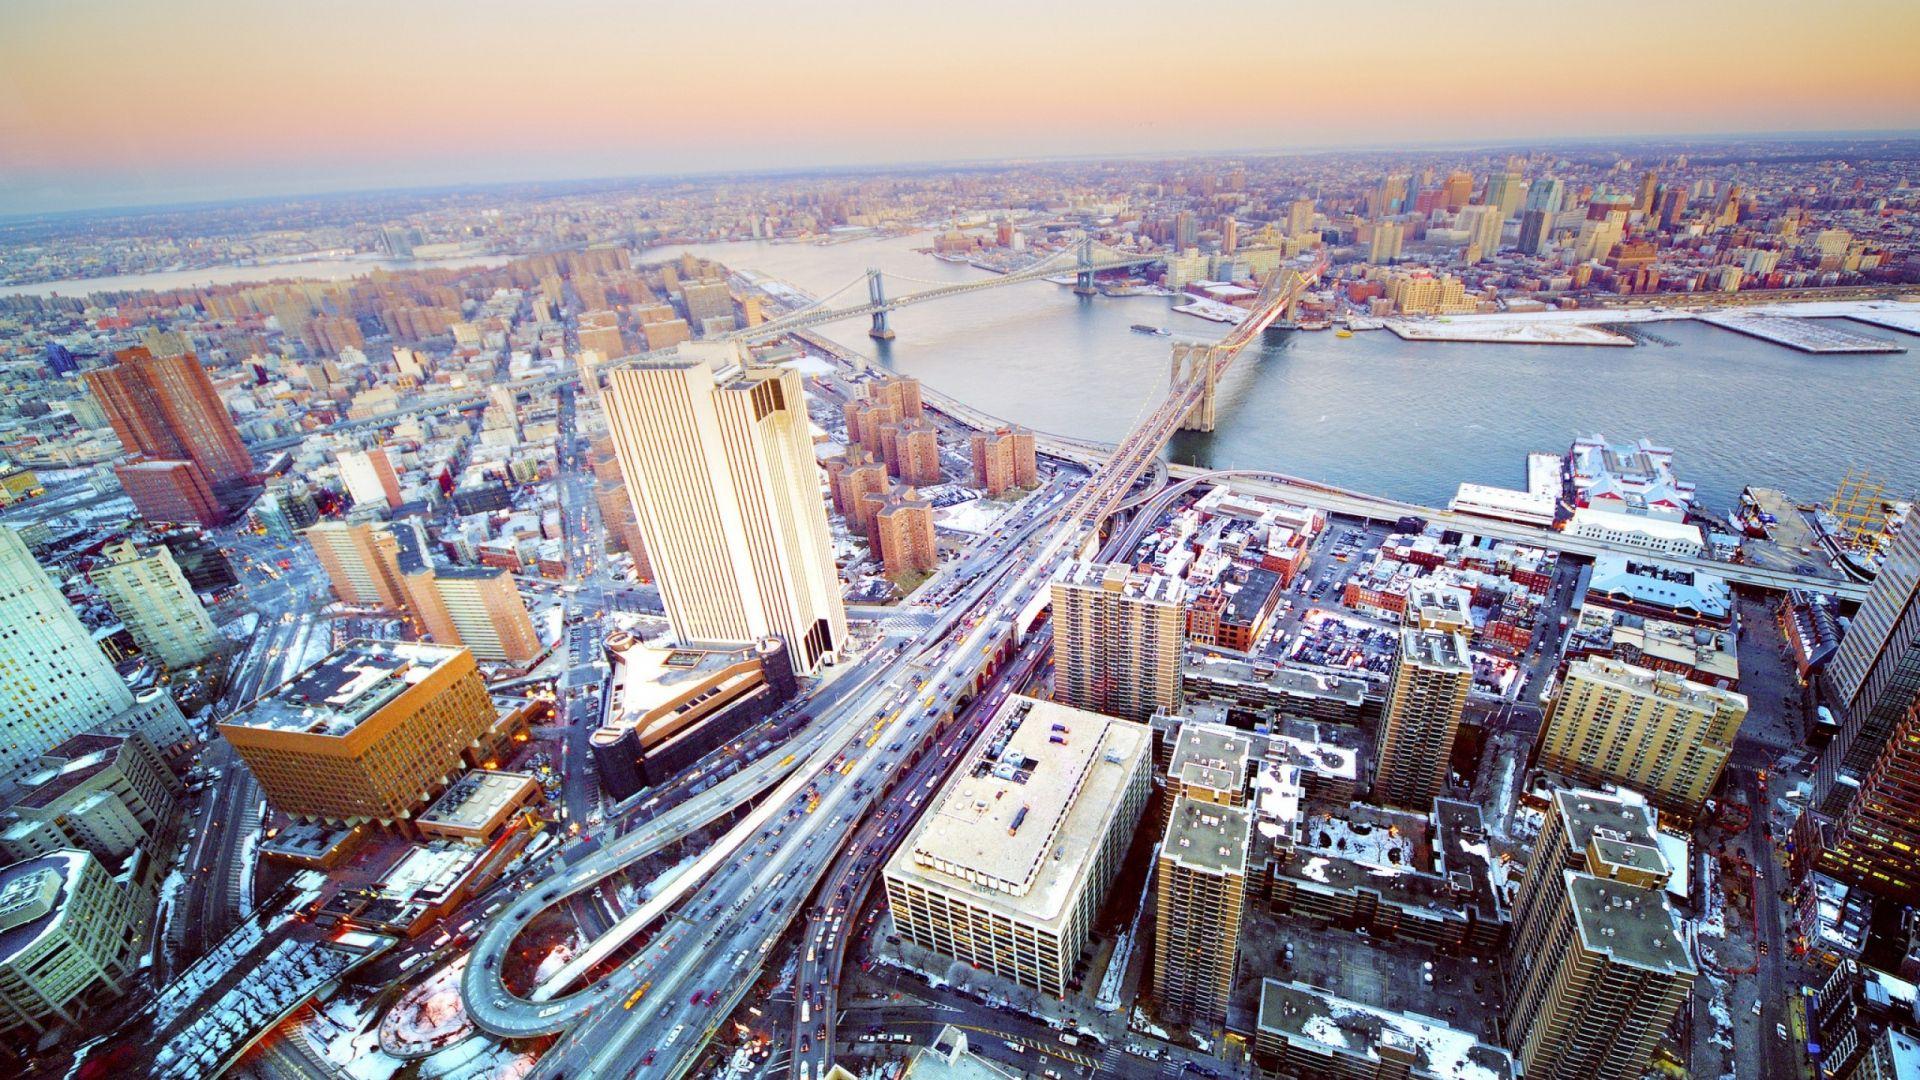 1920x1080 Wallpaper City Top View Panorama Building Metropolis